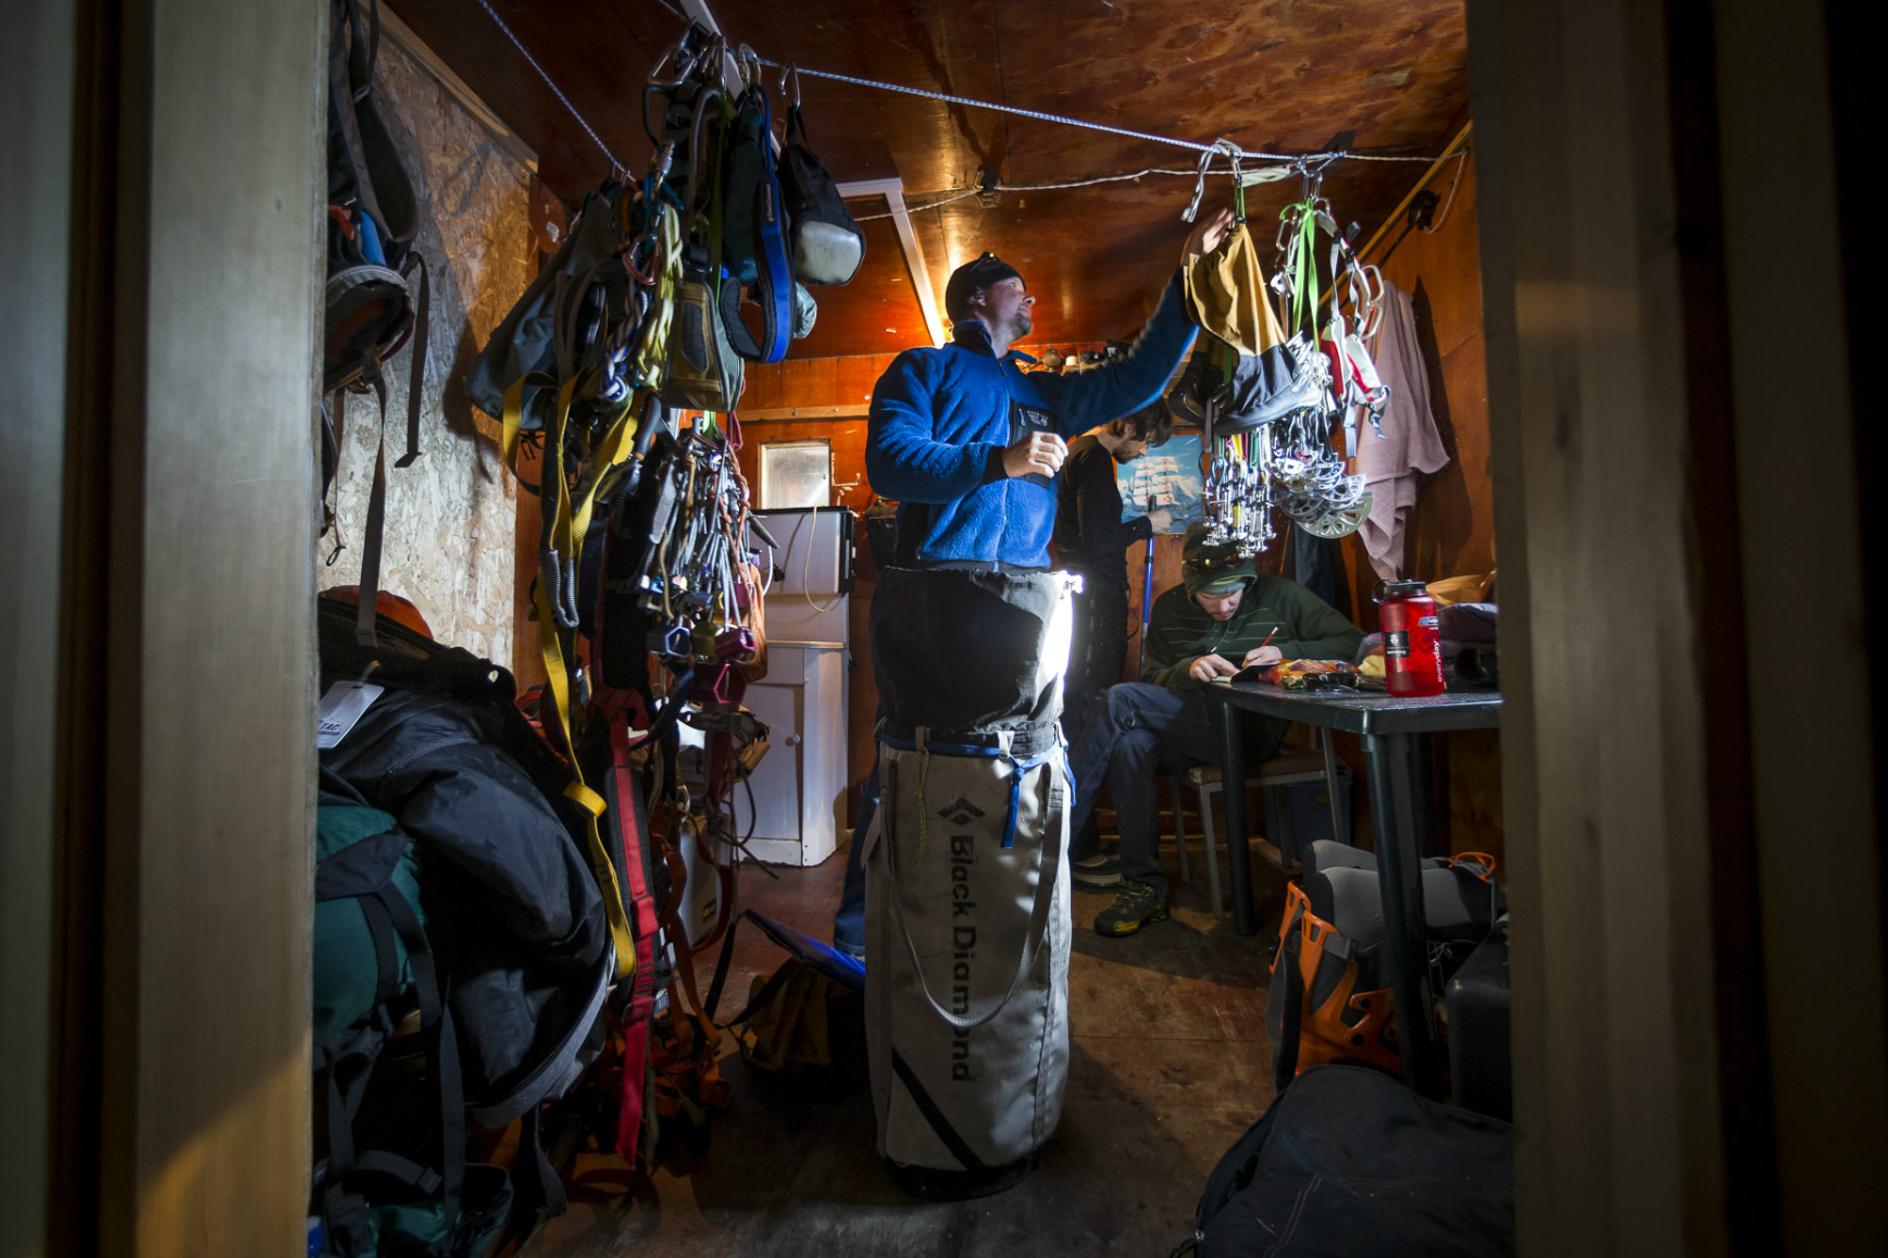 Cory-Richards-Photographer-Antarctica-17.jpg